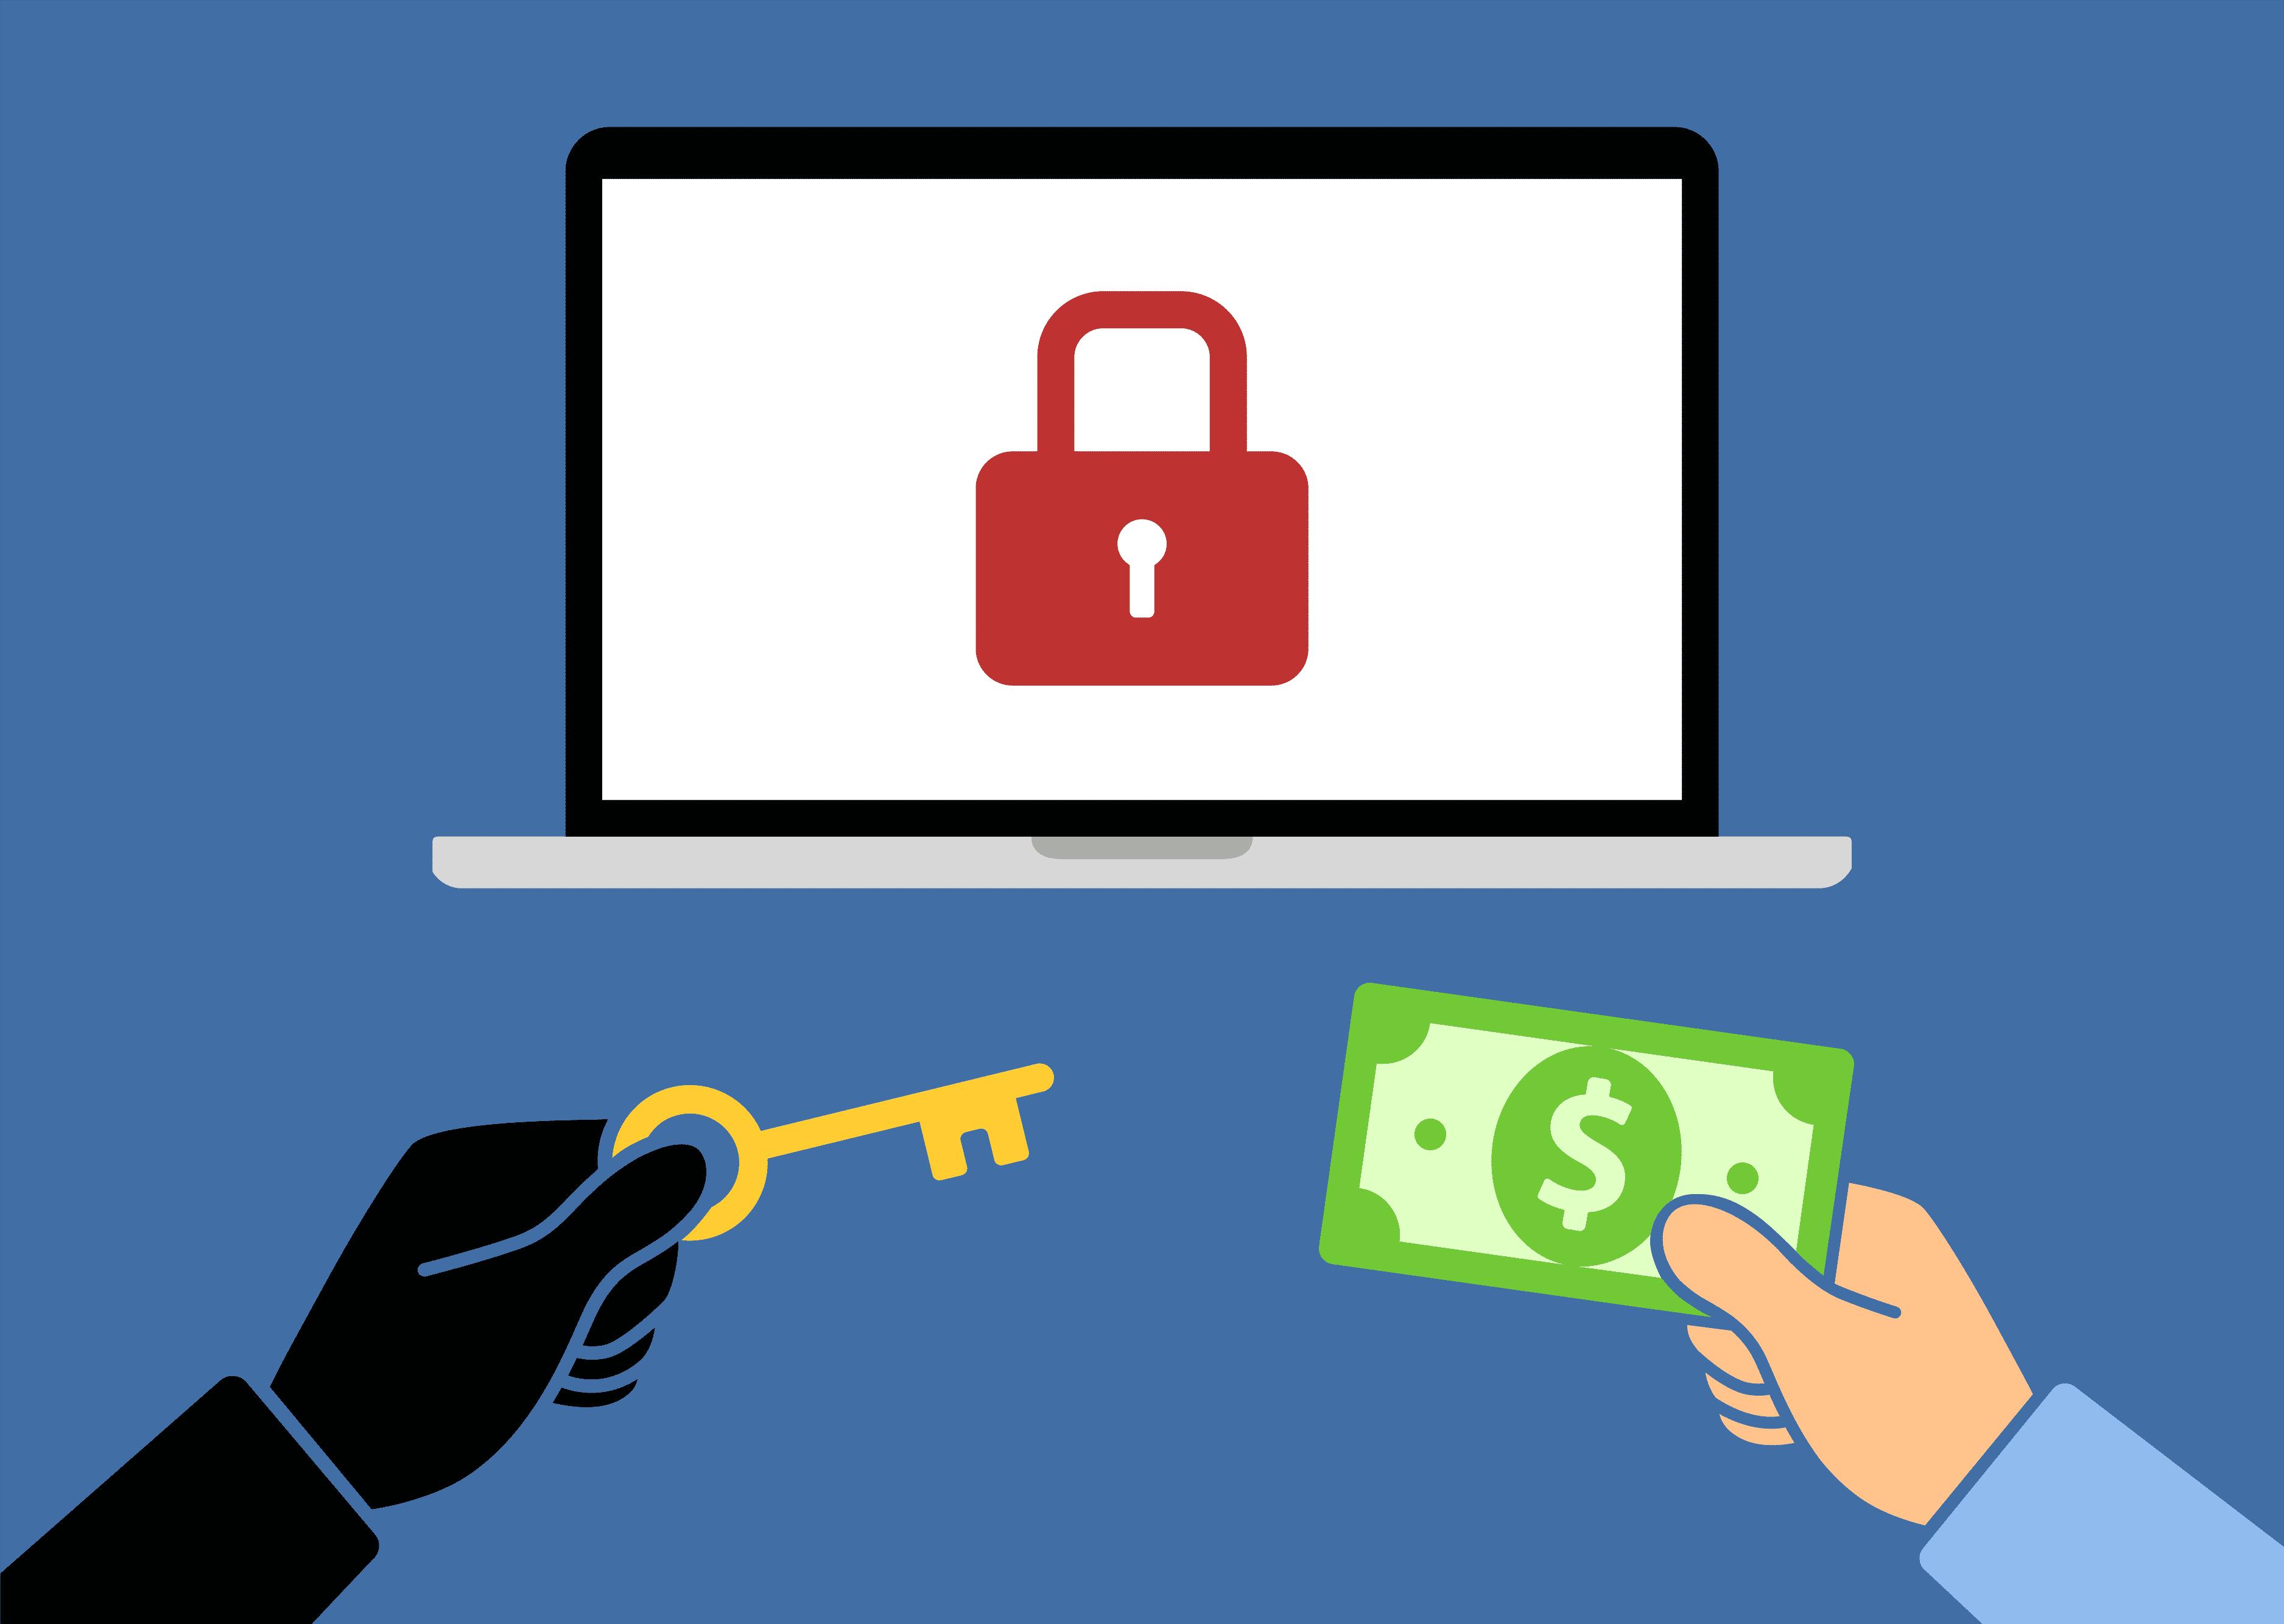 «Snatch Ransomware: Ο εχθρός των Windows, που κρυπτογραφεί δεδομένα χρήστη χρησιμοποιώντας την δυνατότητα ασφαλούς λειτουργίας (Safe Mode)»